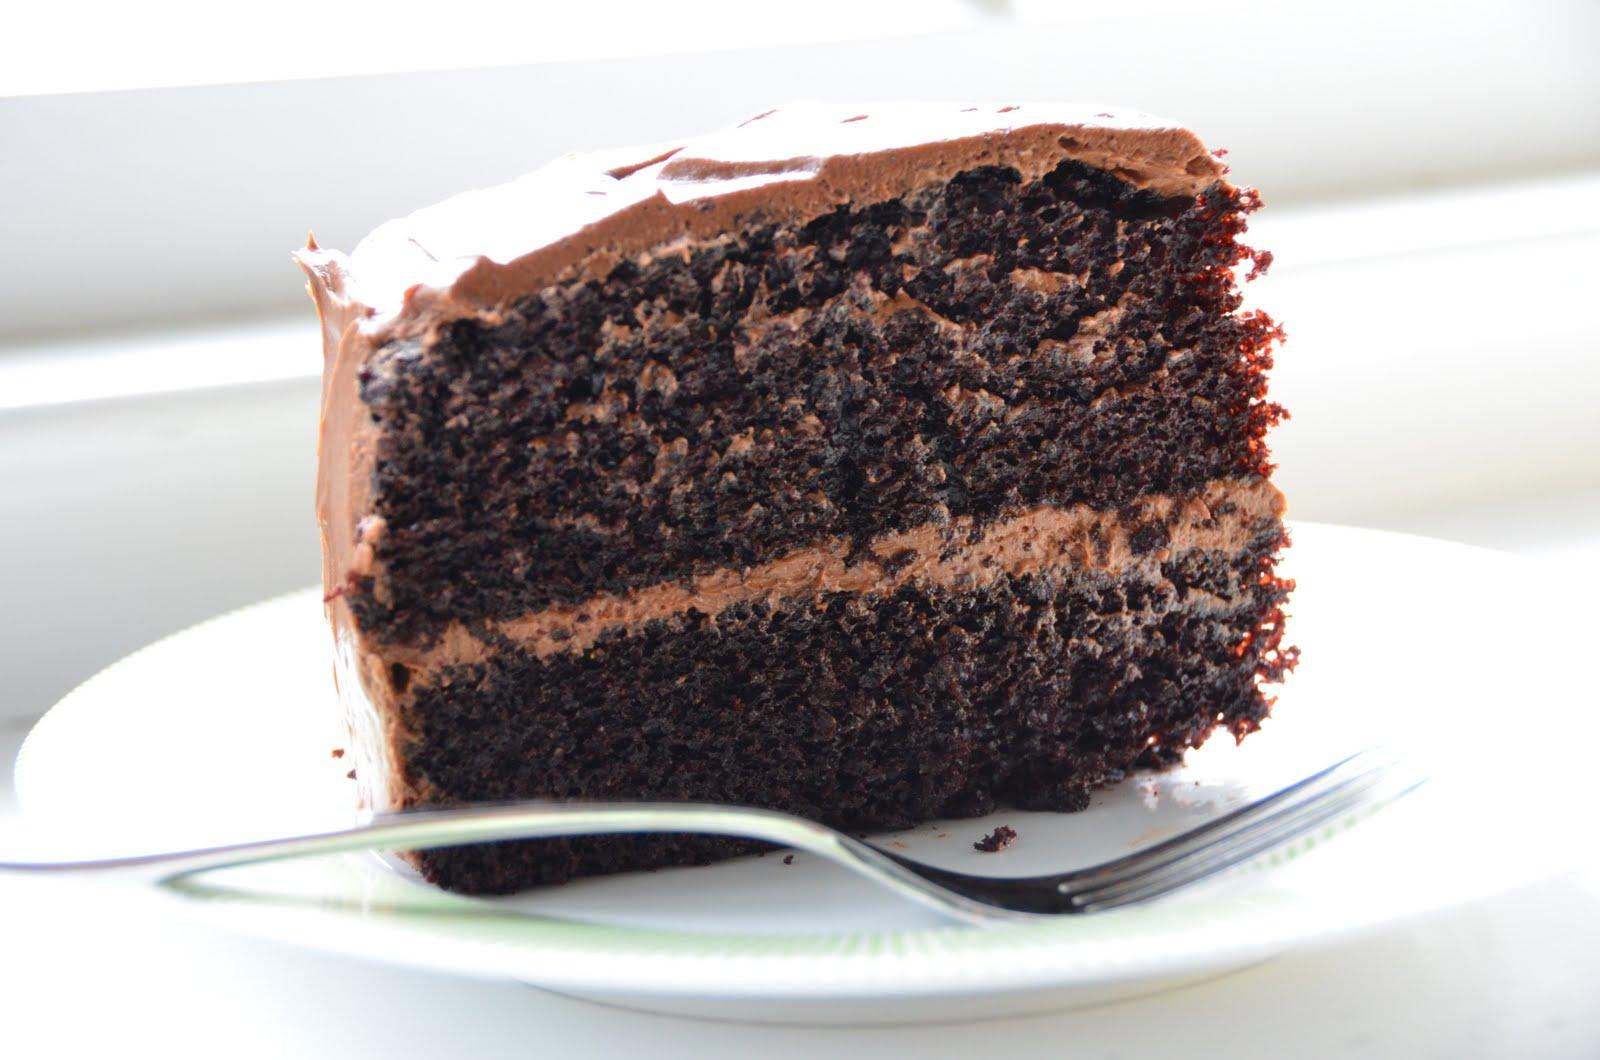 Barefoot Contessa Chocolate Mousse Cake Recipe